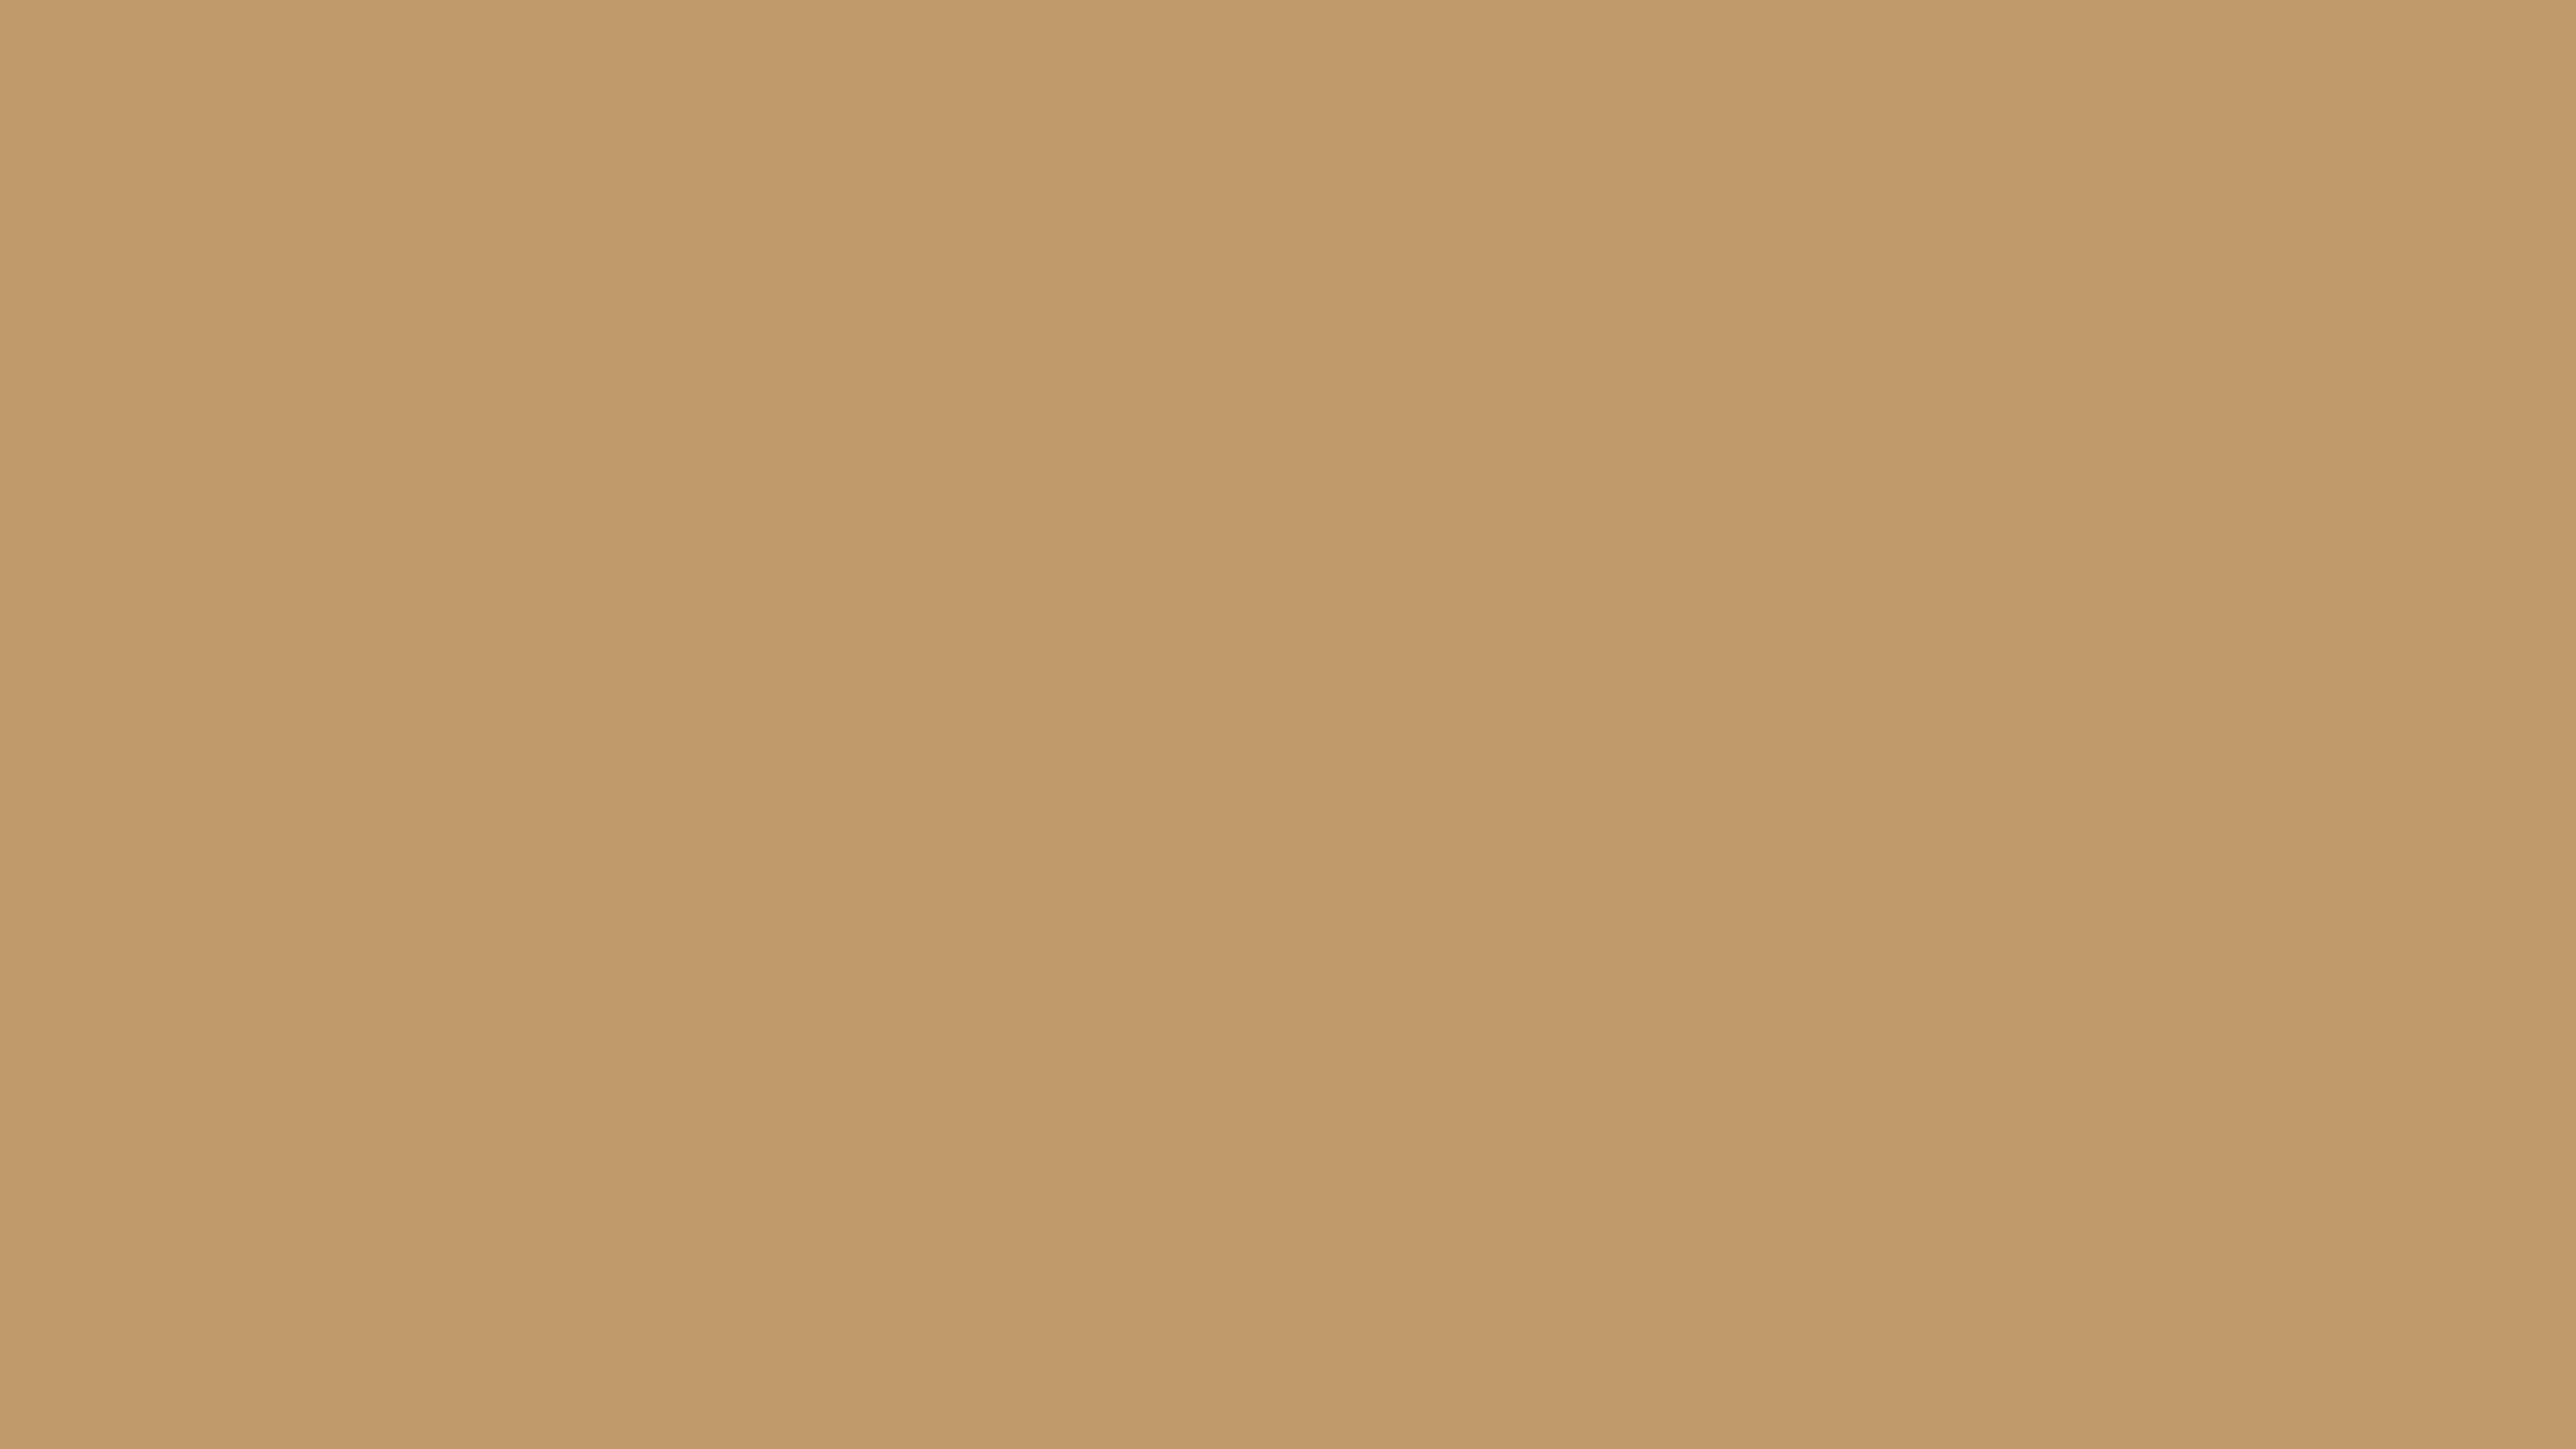 4096x2304 Lion Solid Color Background